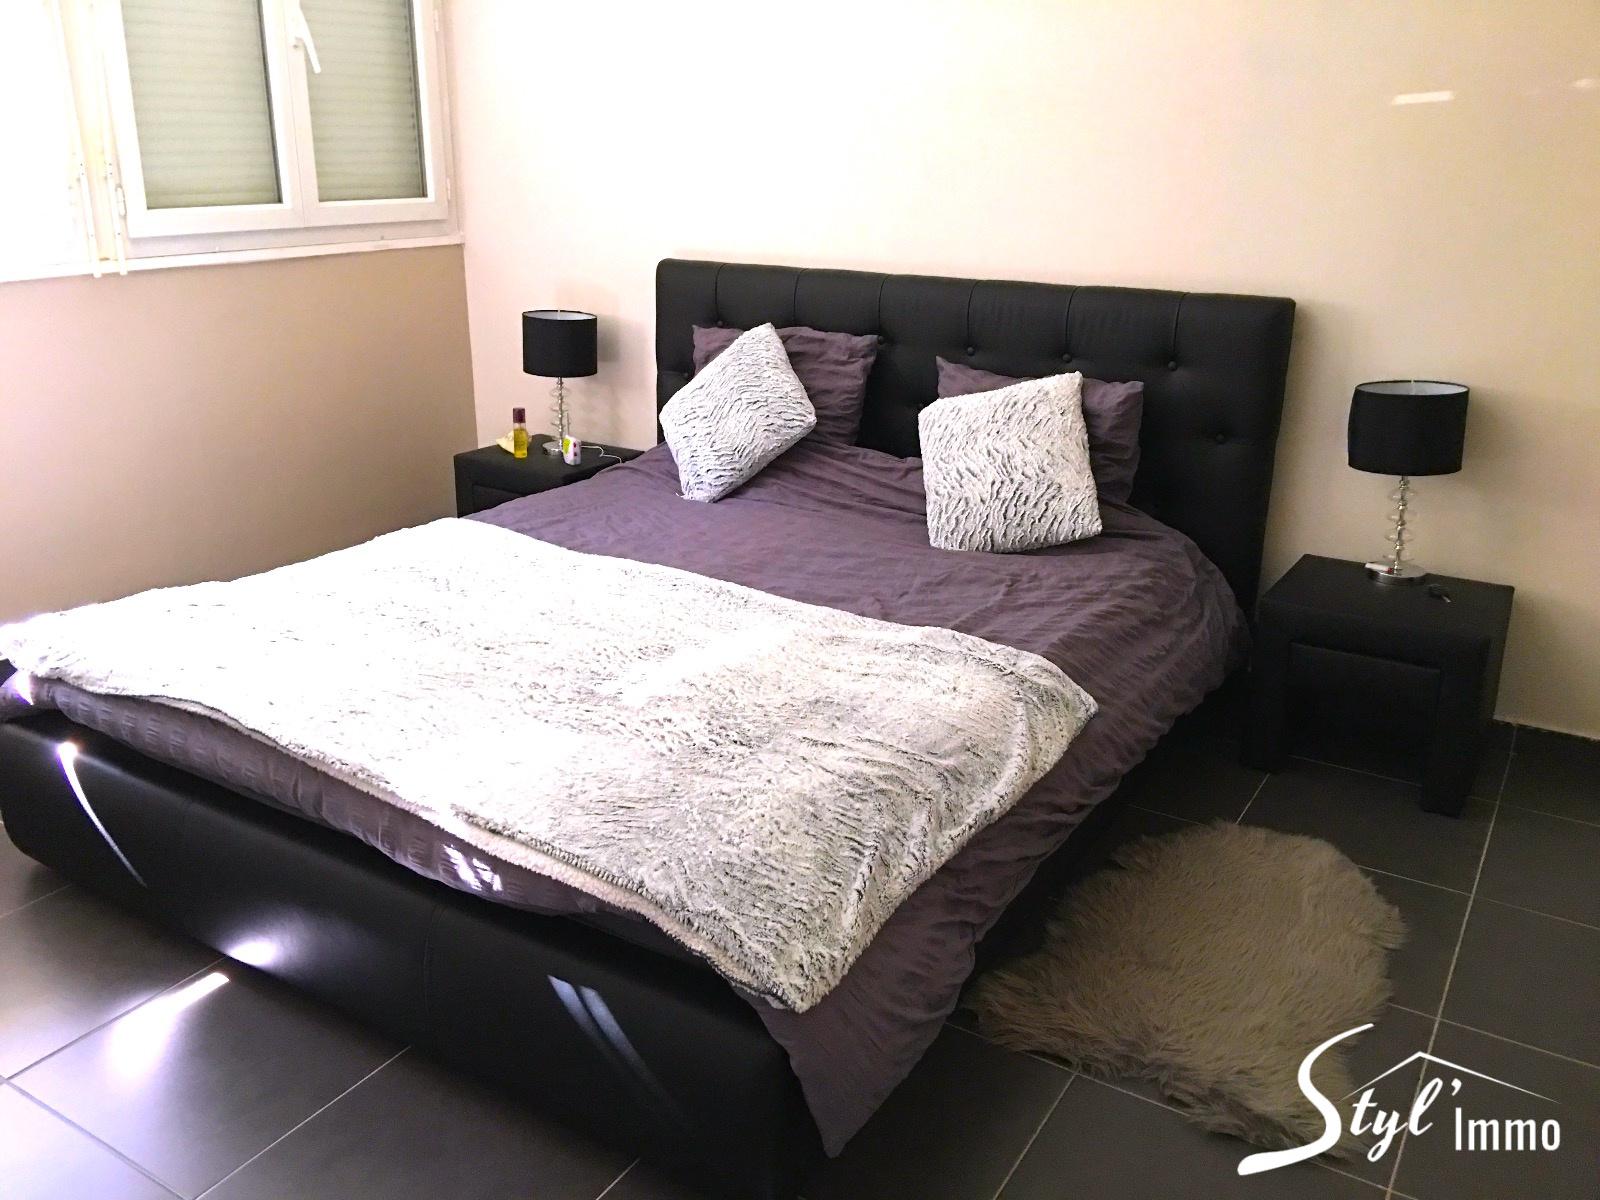 Annonce vente appartement meyzieu 69330 63 m 127 000 for Achat maison meyzieu